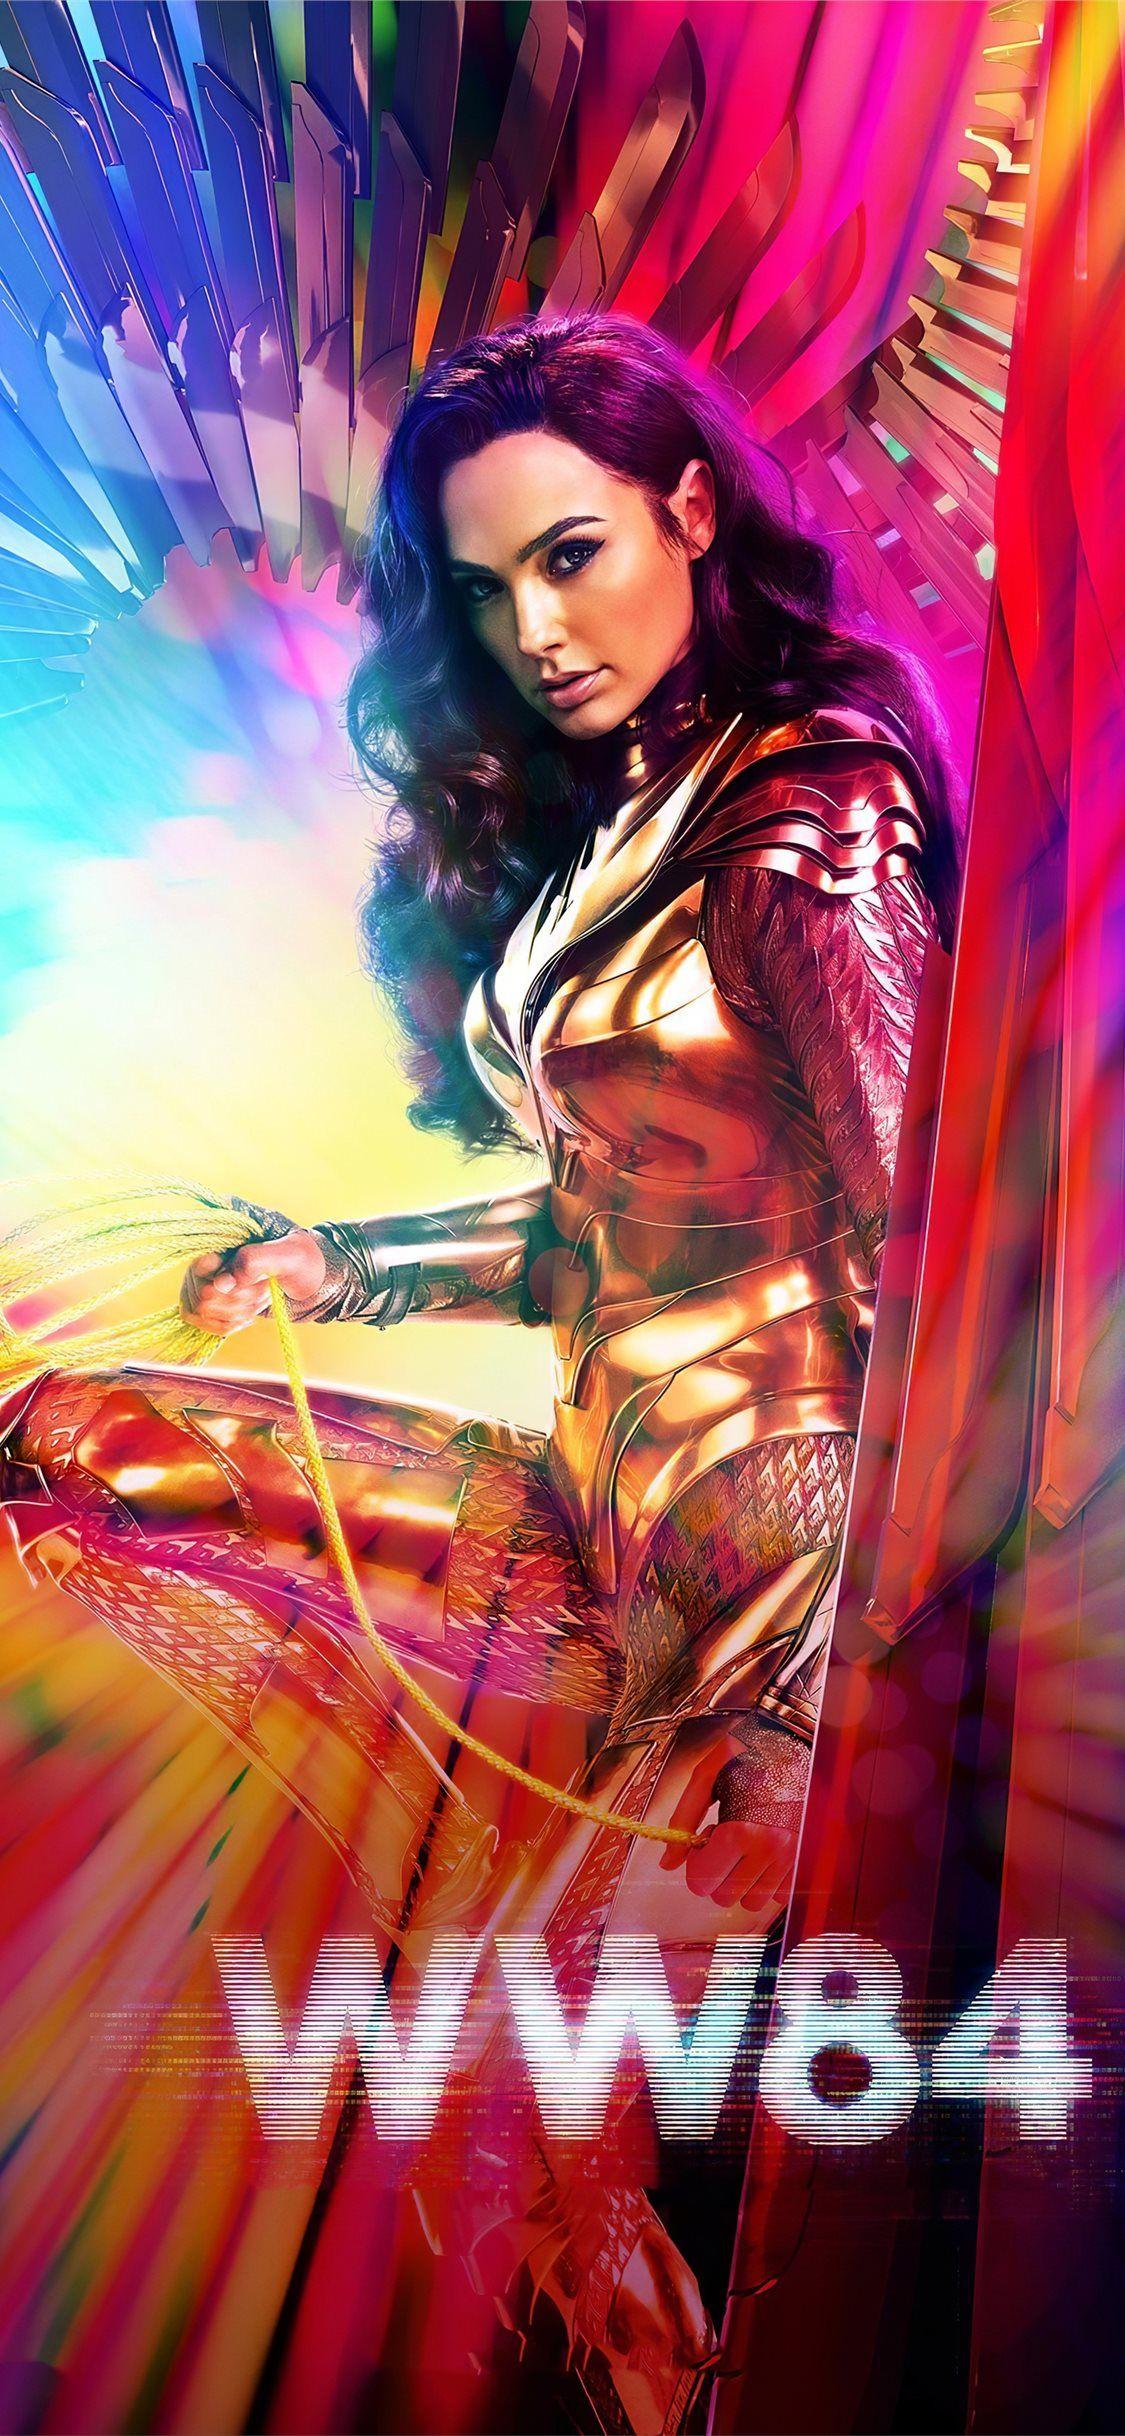 Wonder Woman 1984 4k Newposter Wonderwoman1984 Wonderwoman2 Wonderwoman Movies 2020movies Galgadot 4k In 2020 Wonder Woman Art Wonder Woman Tattoo Wonder Woman